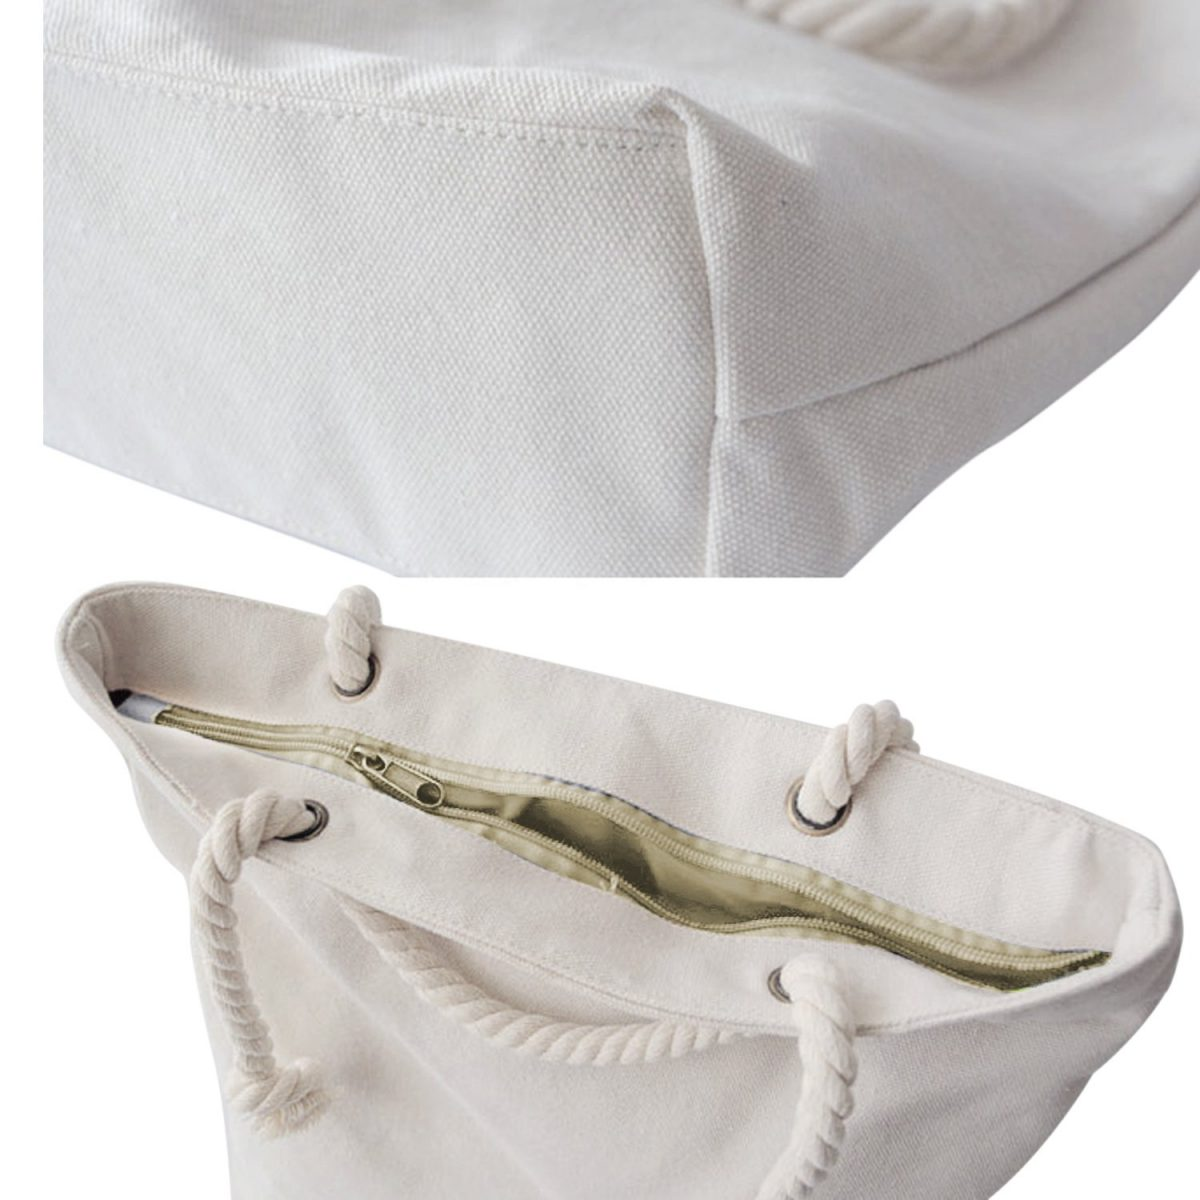 Palmiye Desenli Mermer Zeminli Fermuarlı Modern Kumaş Çanta Realhomes